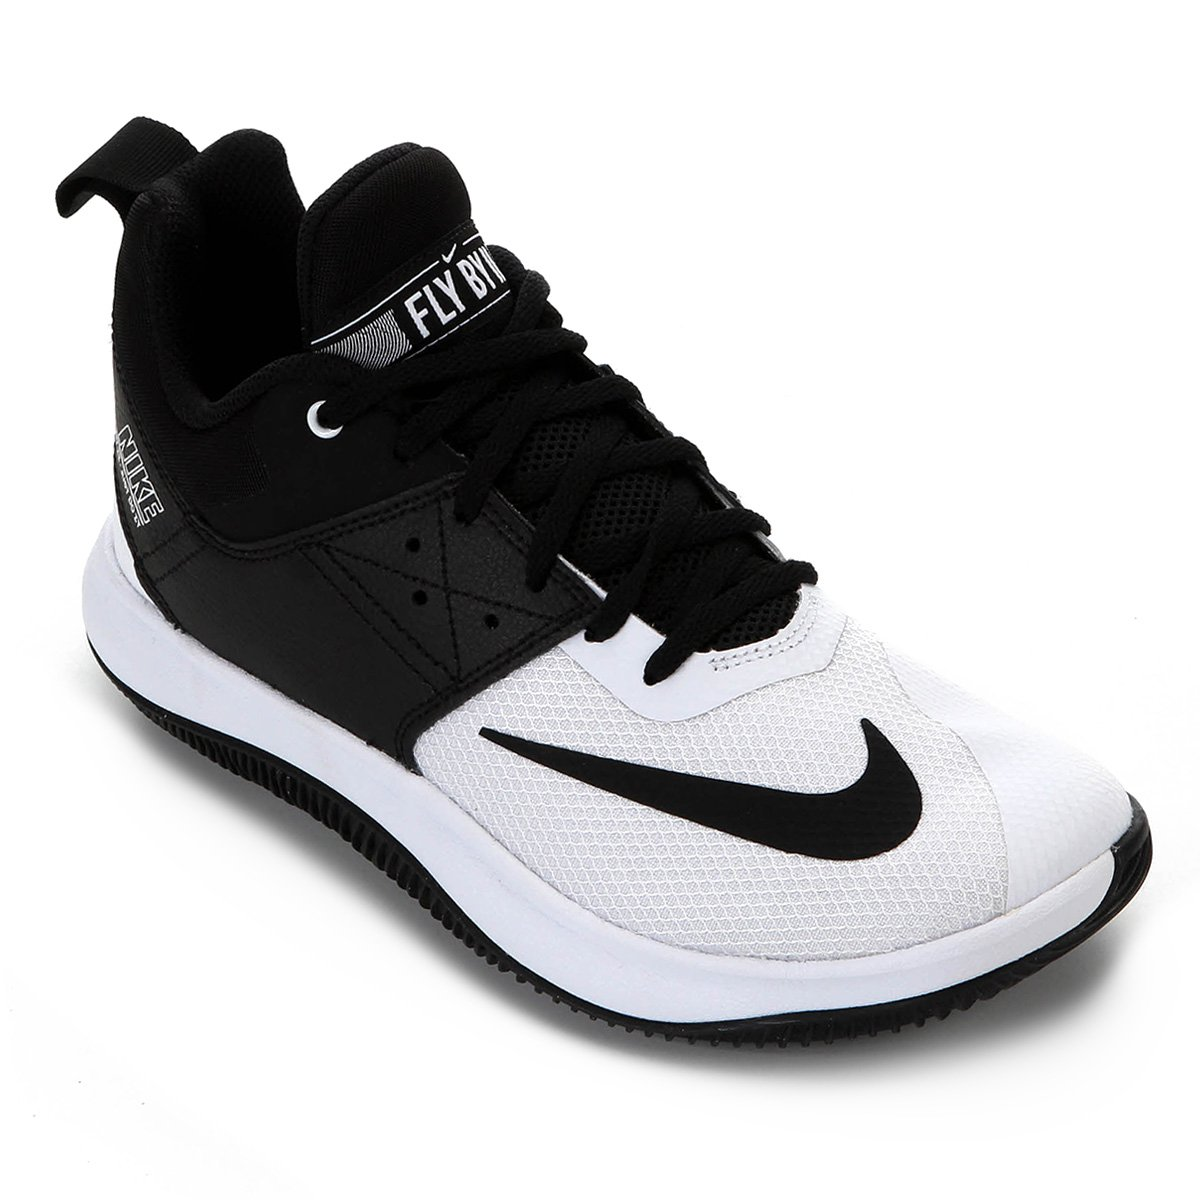 13ccd4c47 Tênis Nike Fly By Low II Masculino - Preto e Off White | Loja NBA